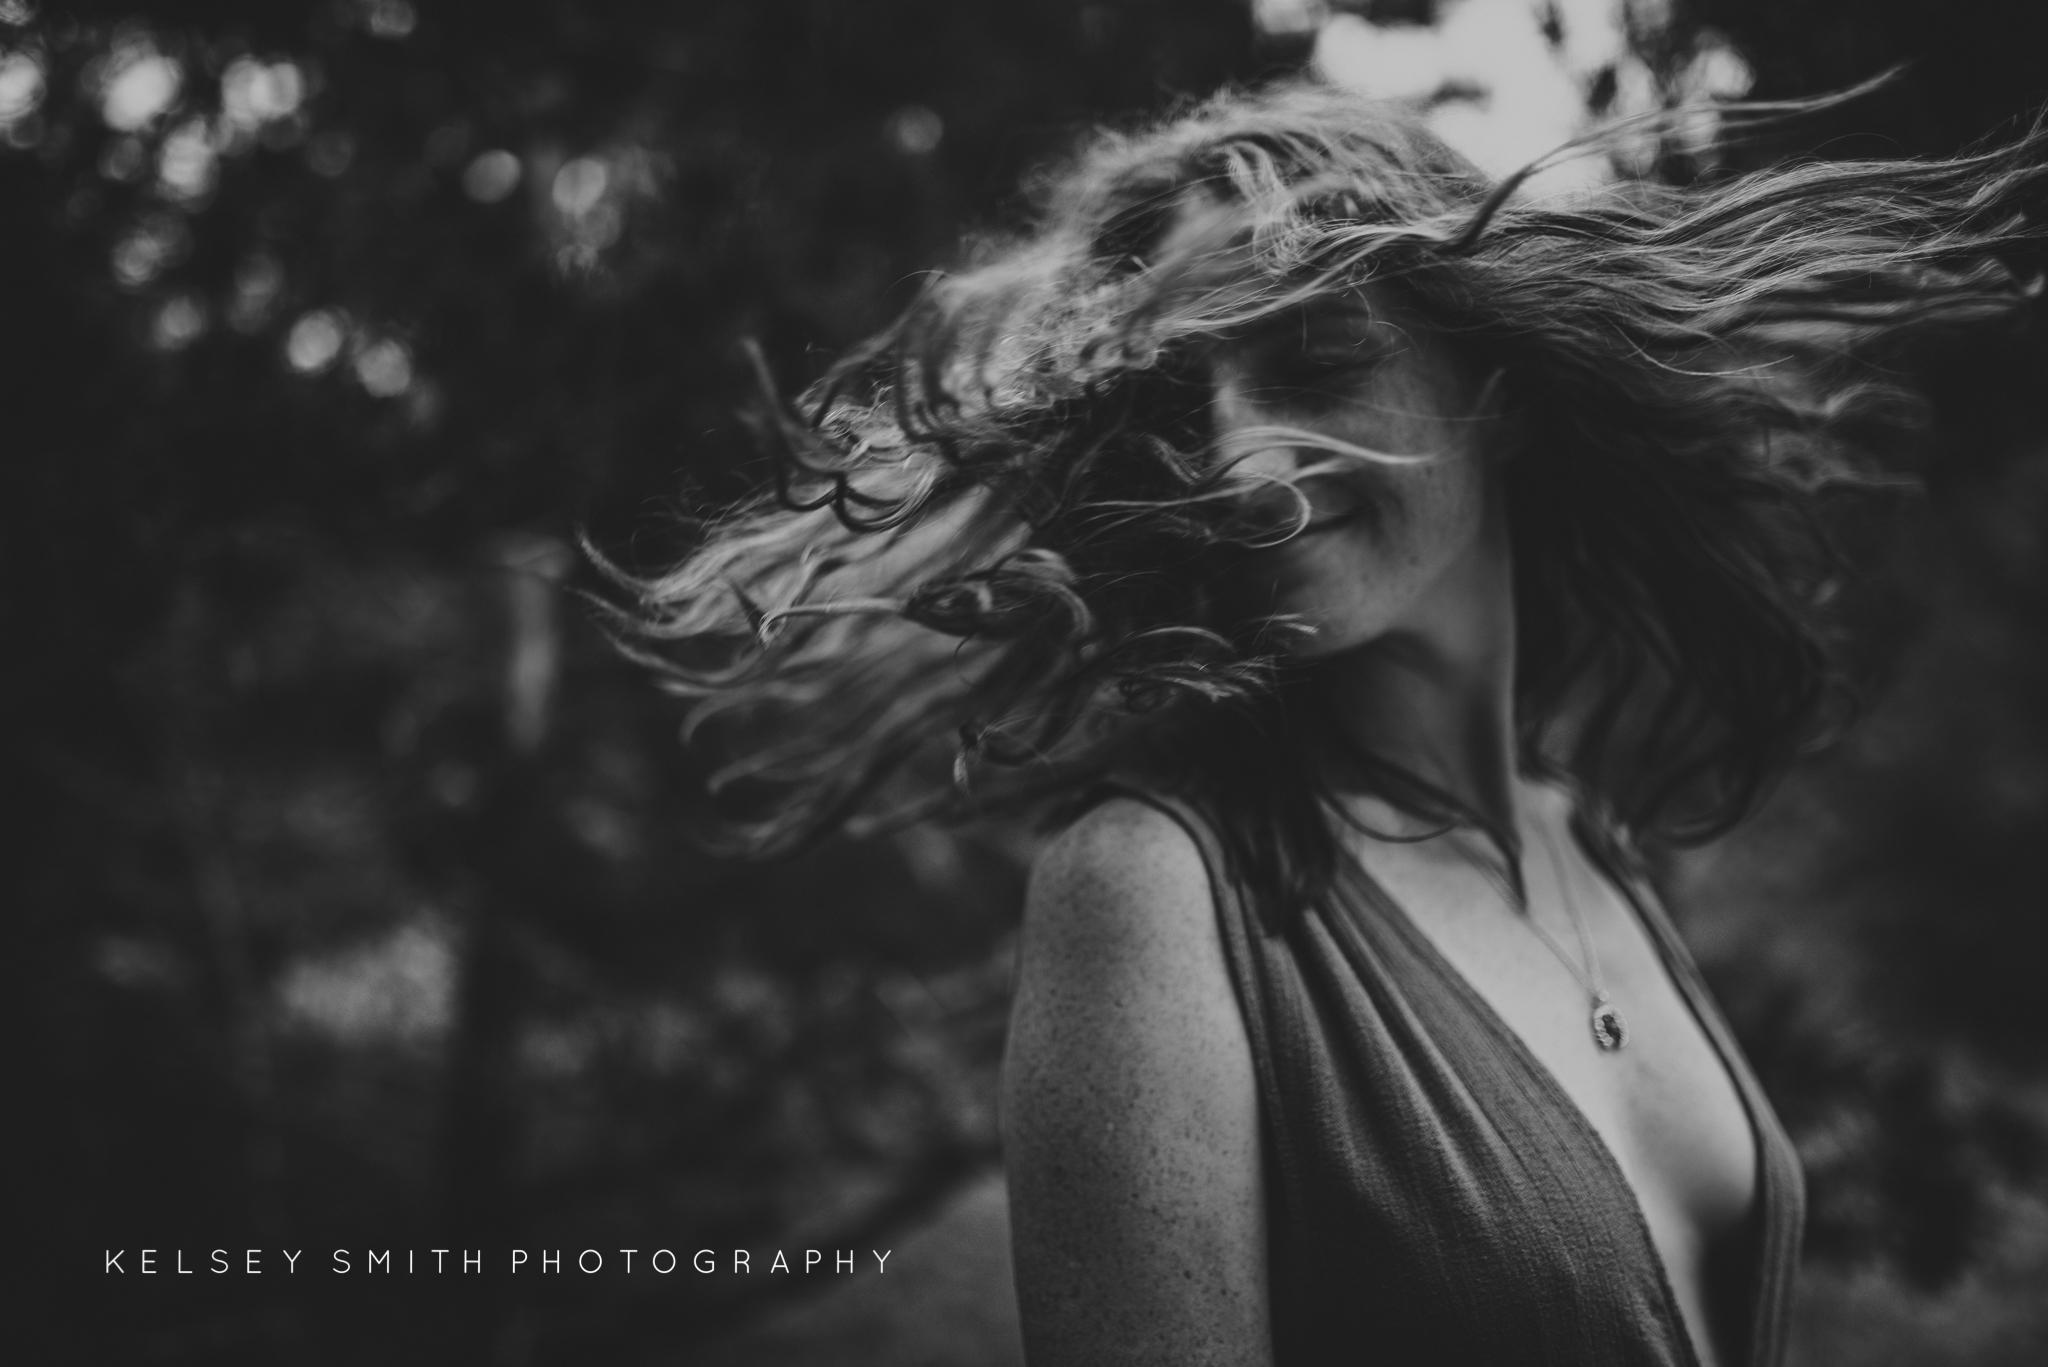 TheDeadTreeSociety_KelseySmithPhotography (Web Resolution)-1.jpg